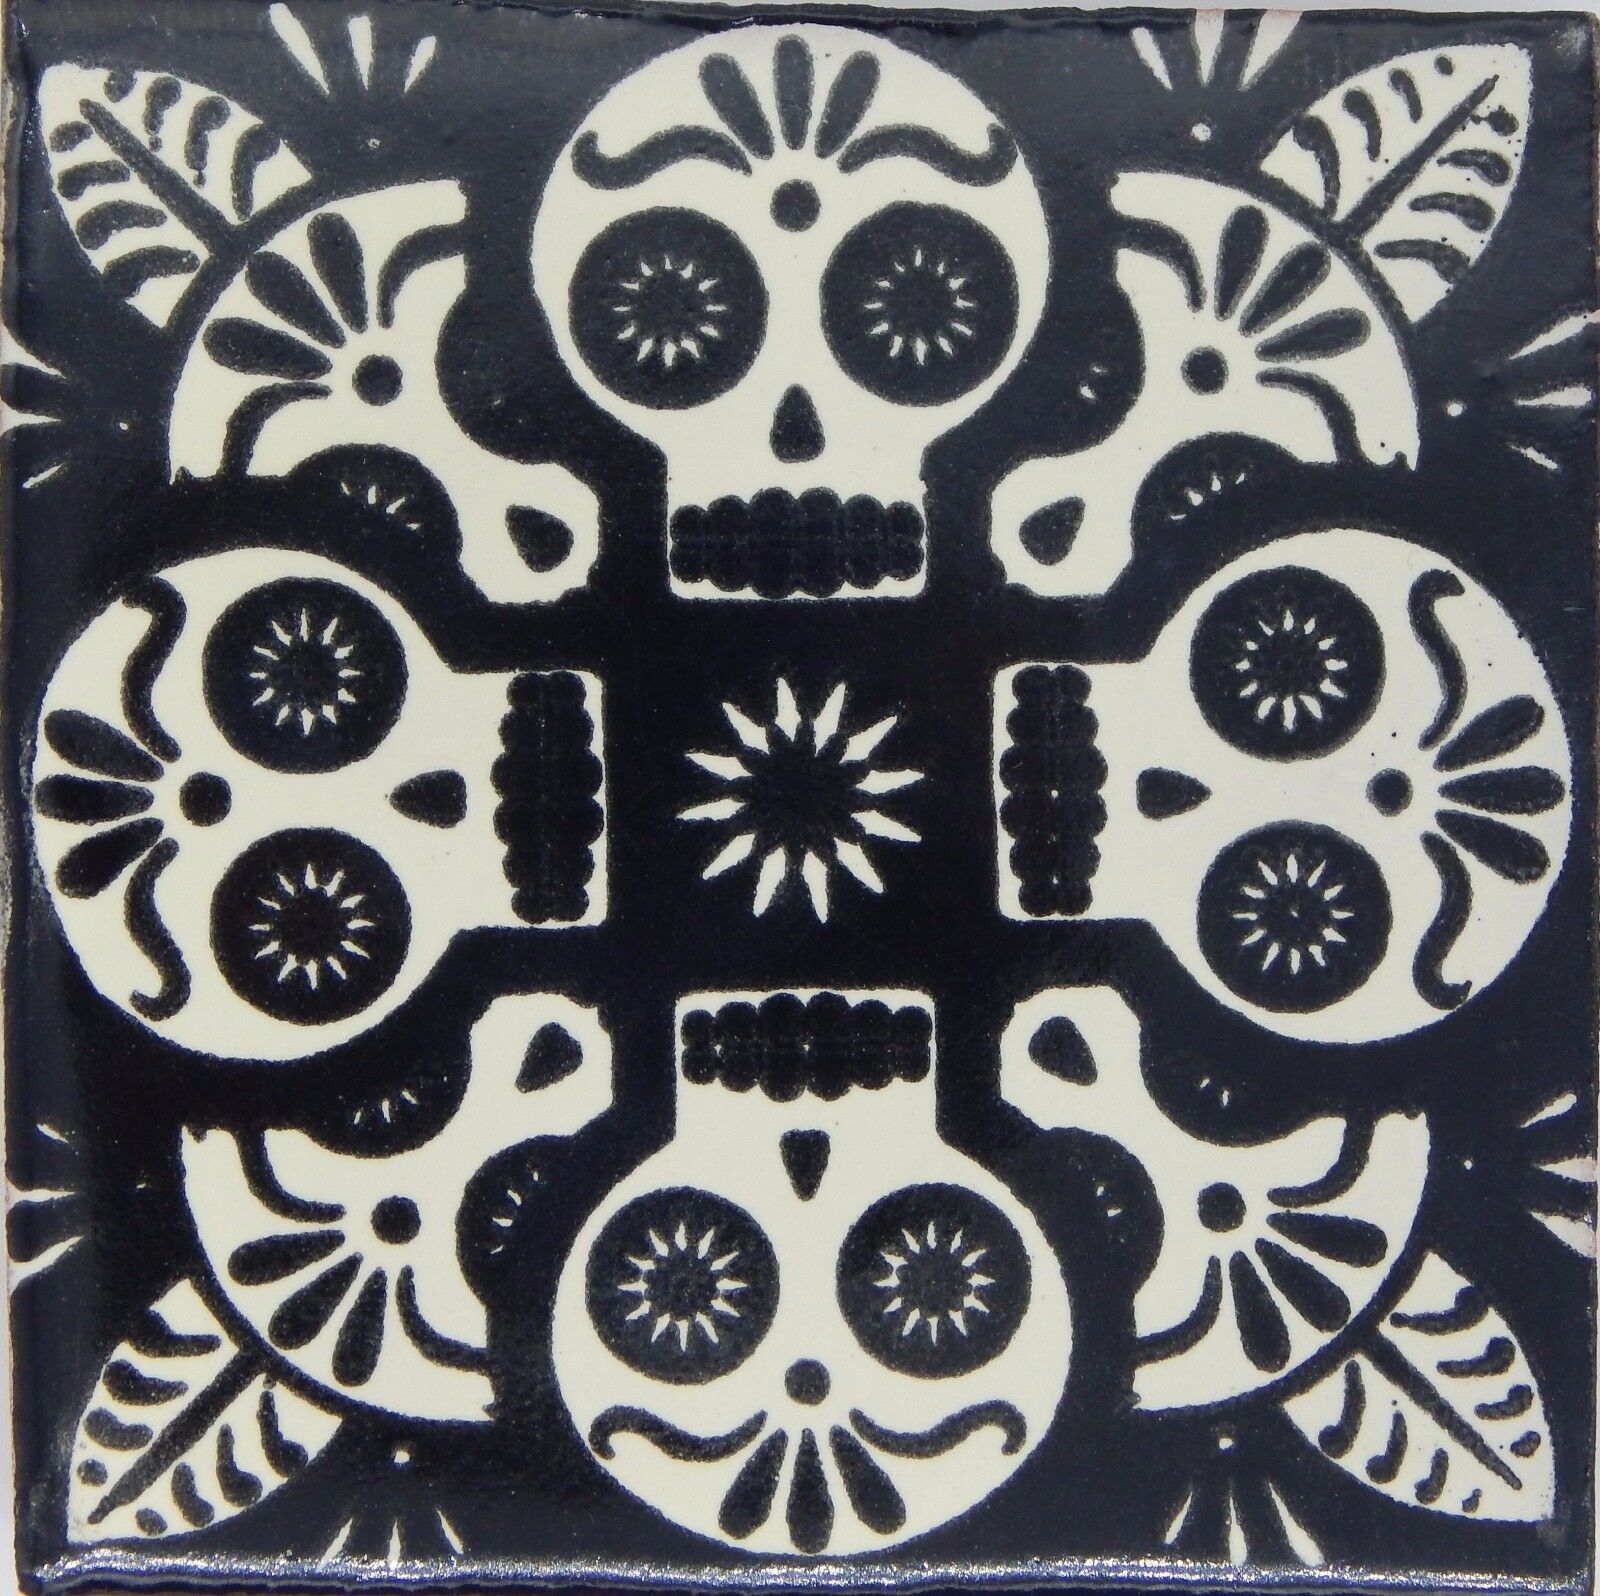 100 Mexican Talavera tiles 4x4 Decorative Folk Art Handmade C399